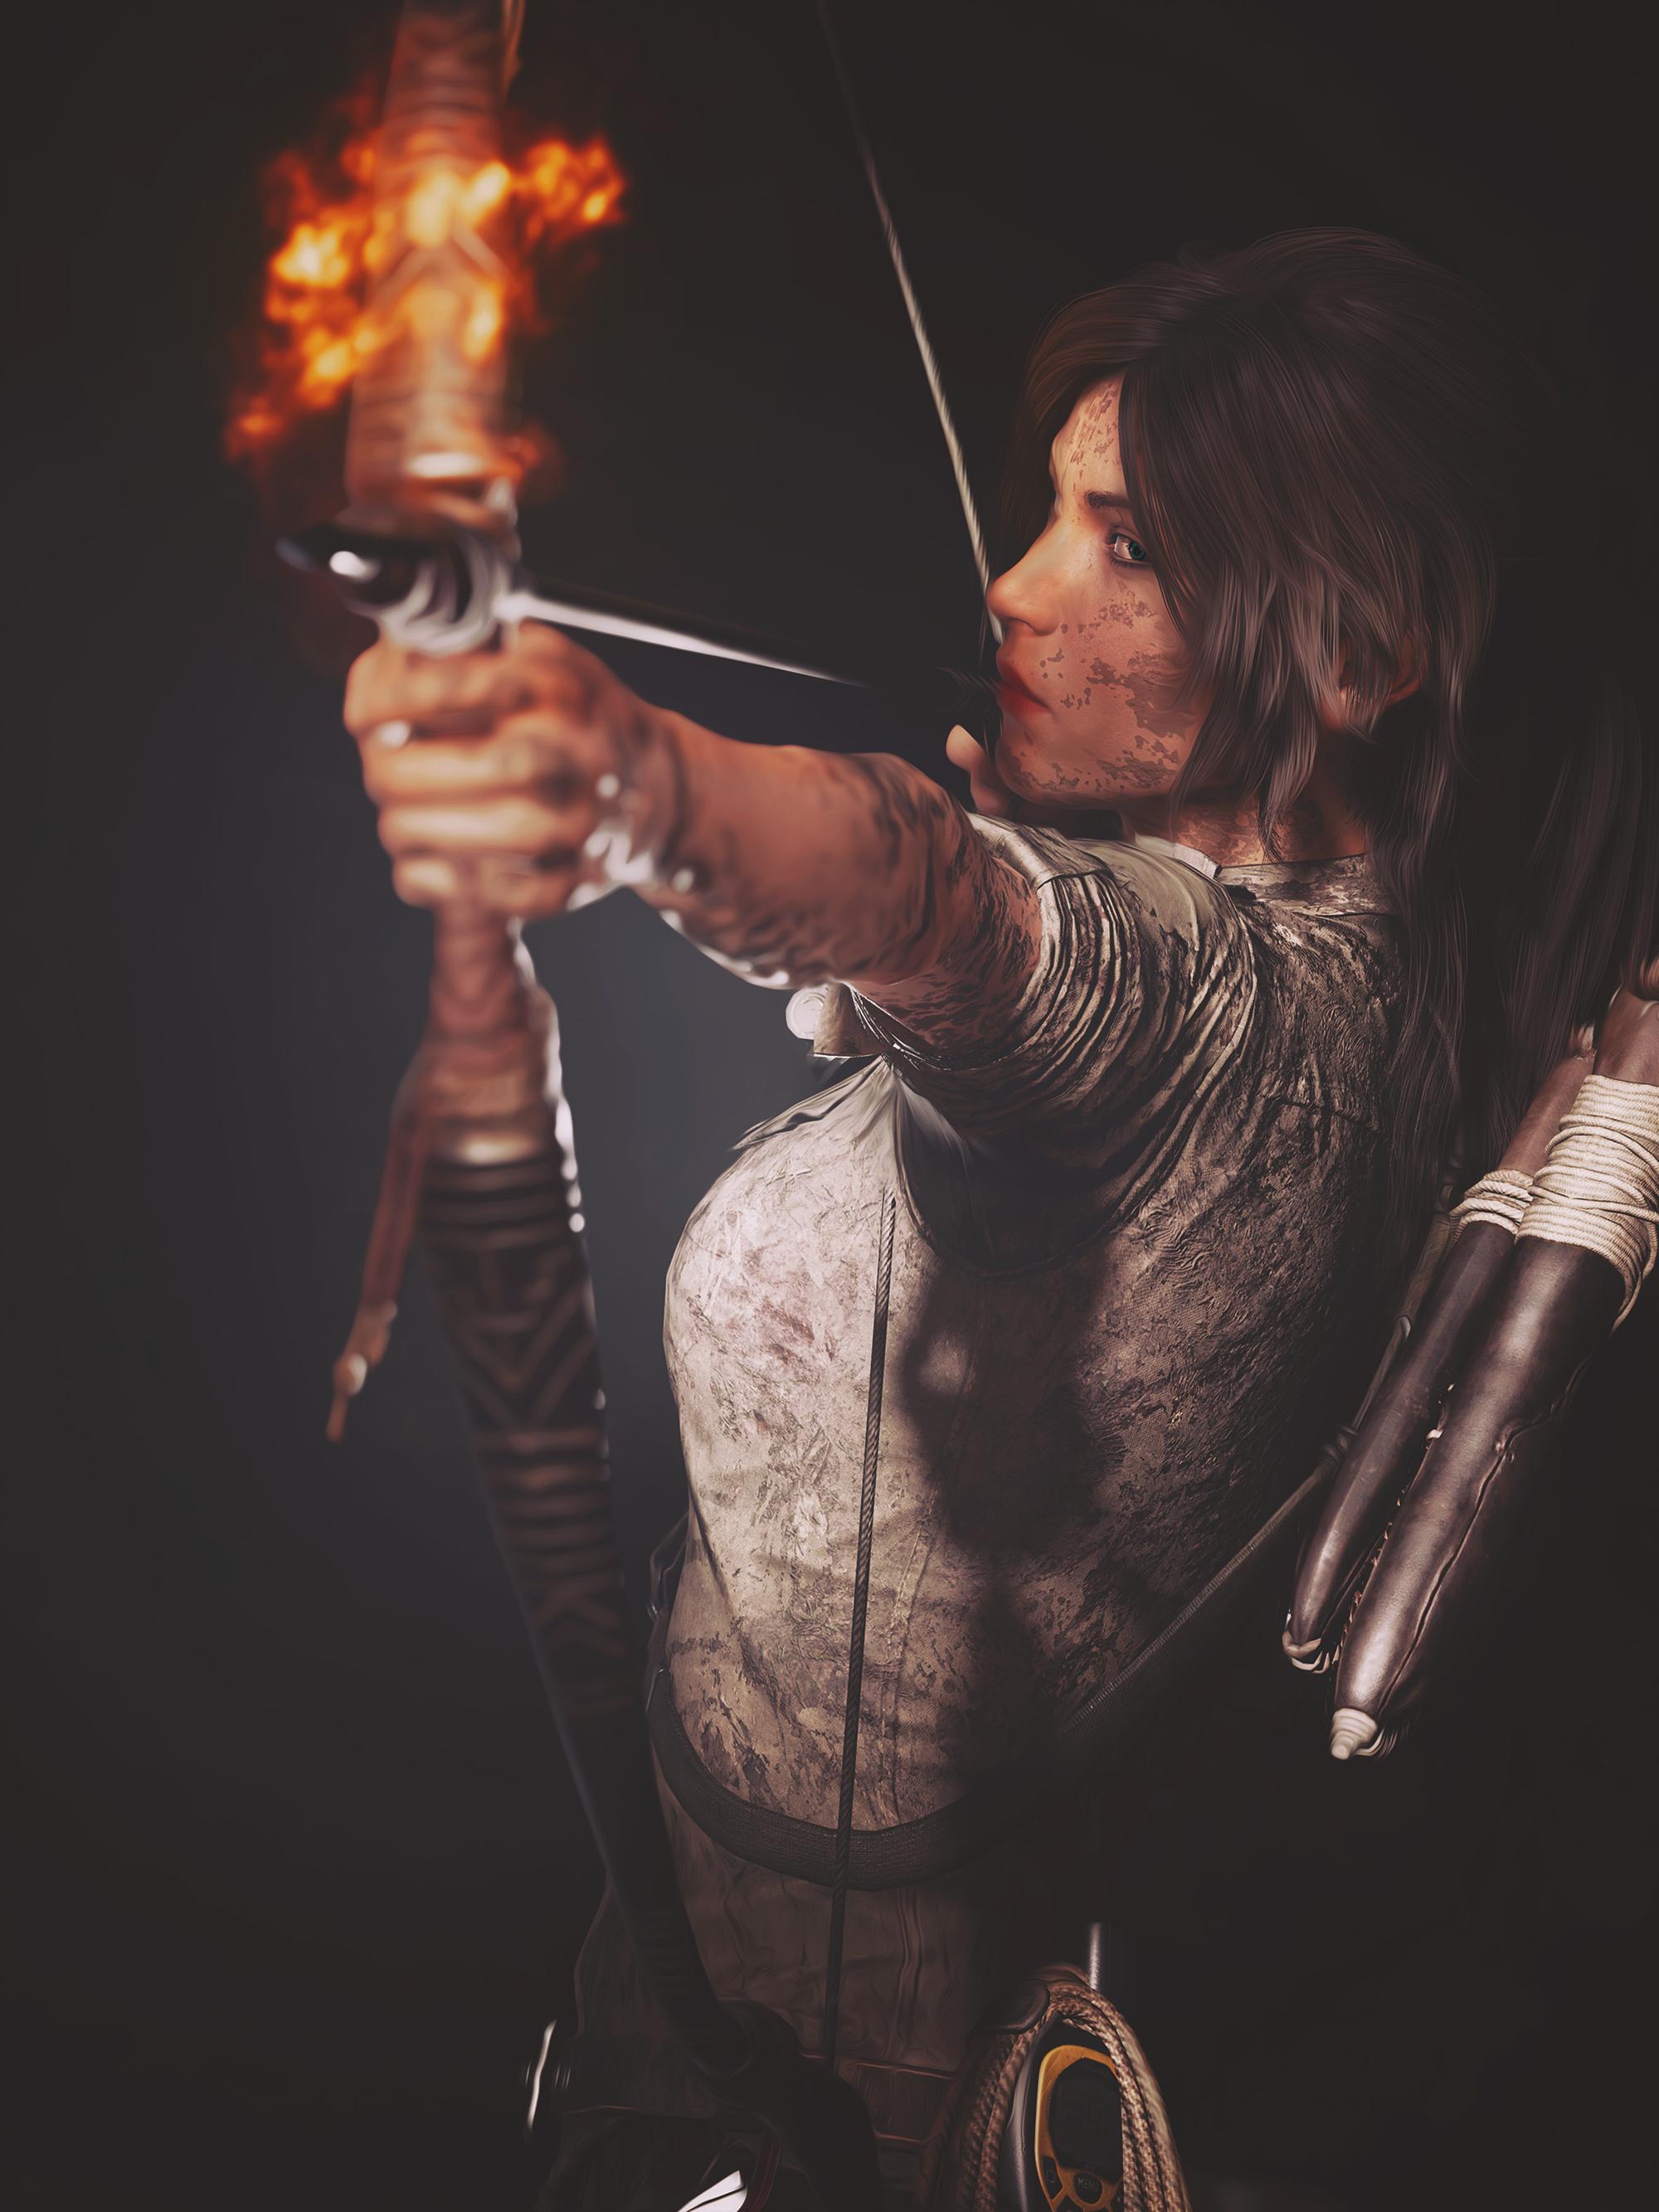 General 2000x2667 Lara Croft fire dark tomb raider 2013 video game girls Tomb Raider bow PC gaming video game art aiming video games